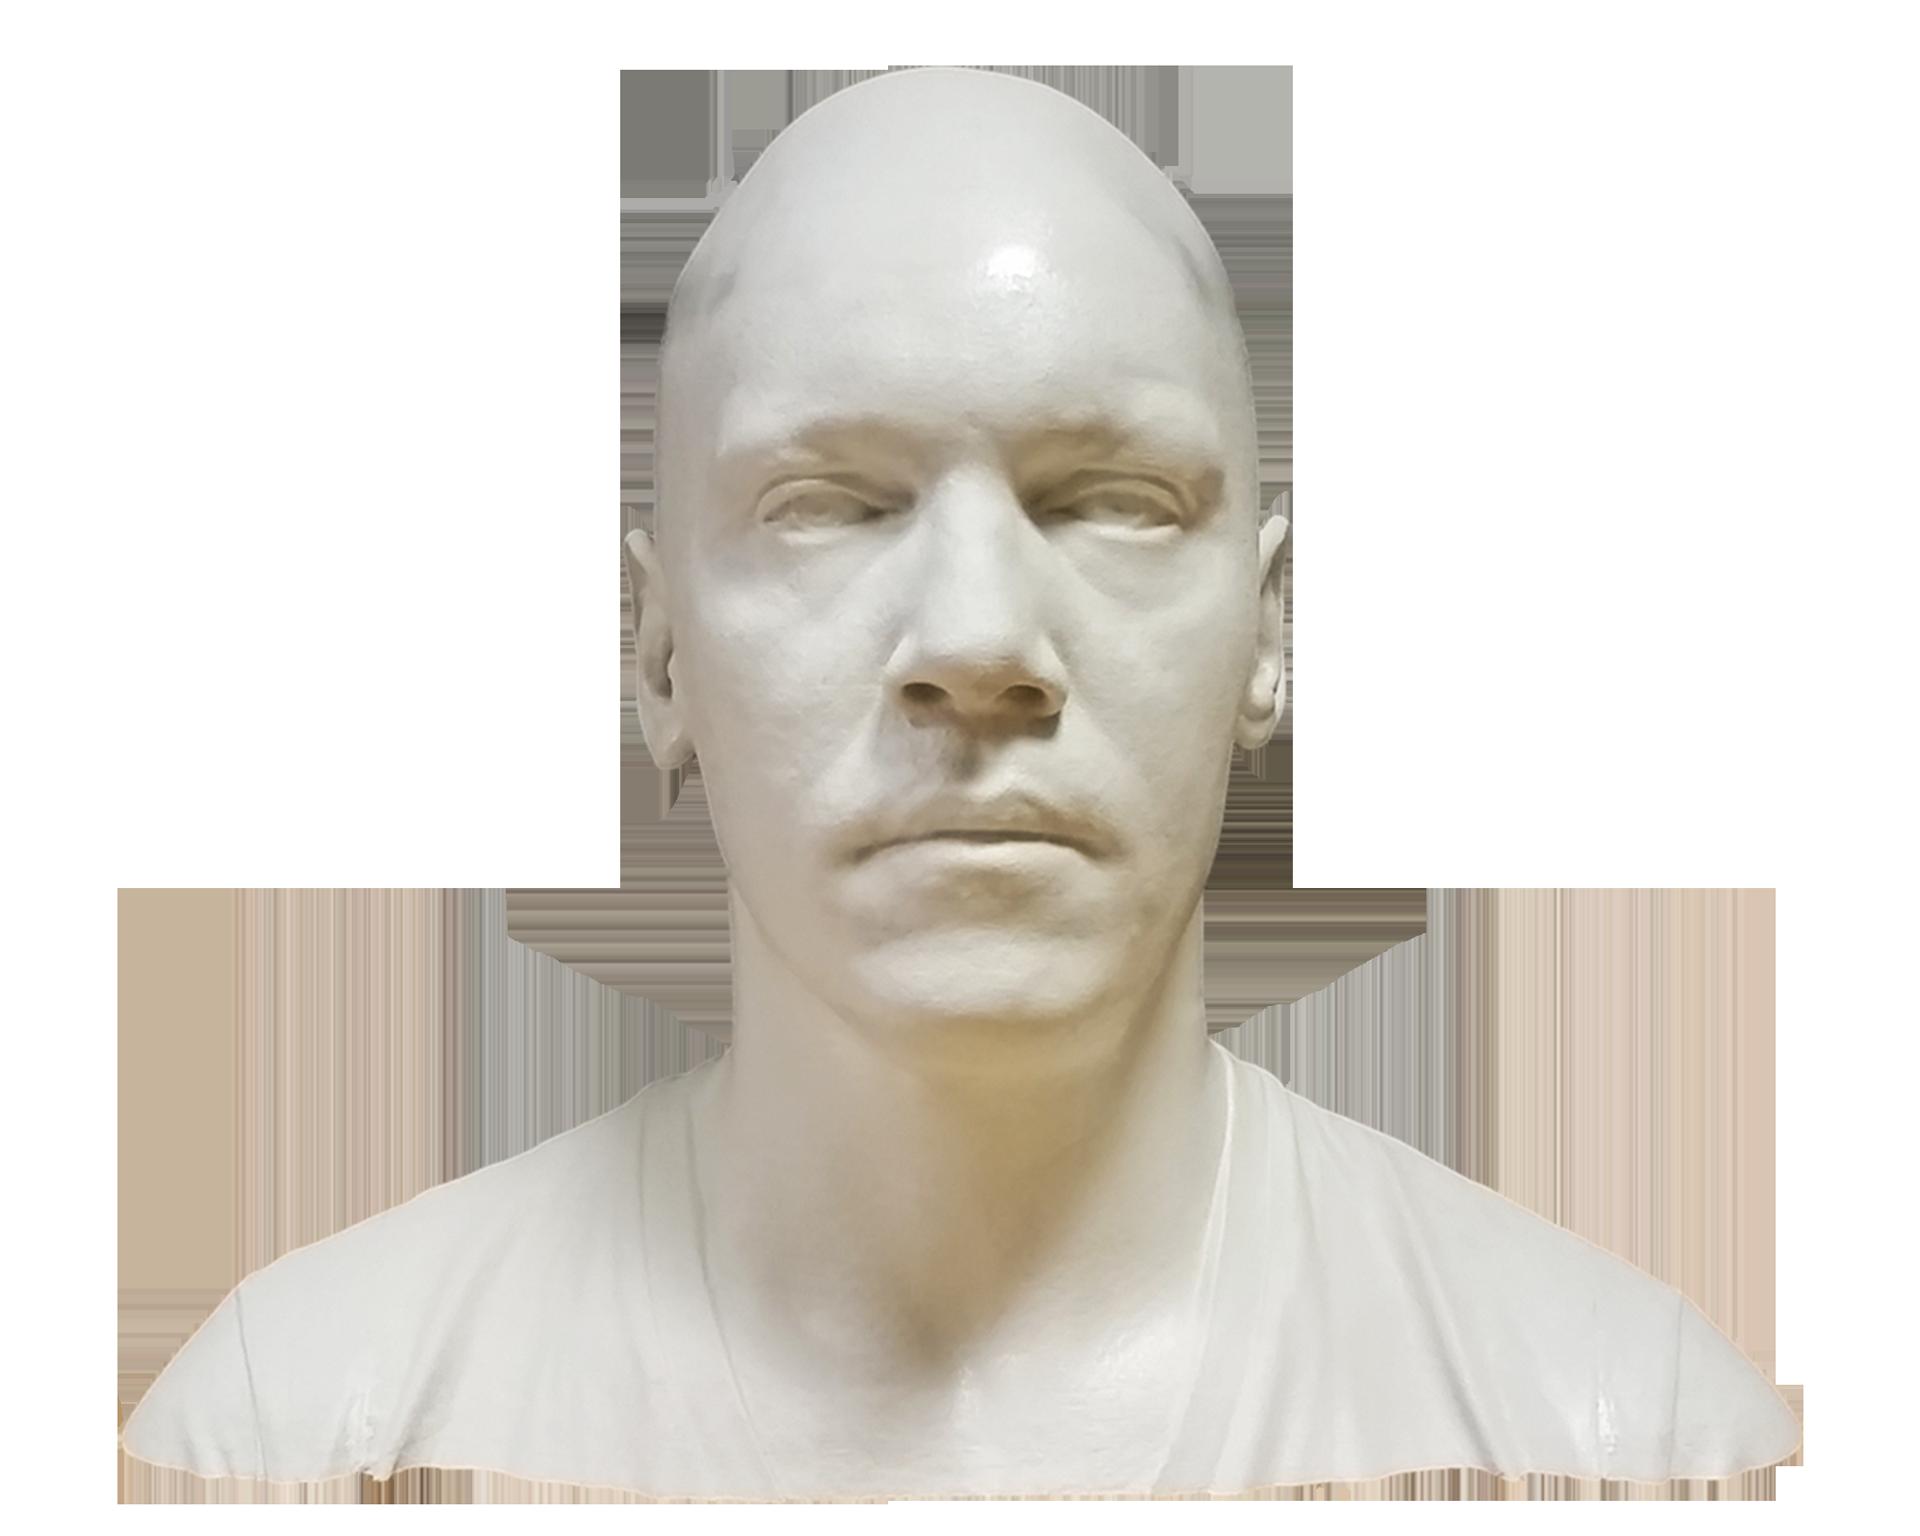 jonathan rhys meyers 3D Printed